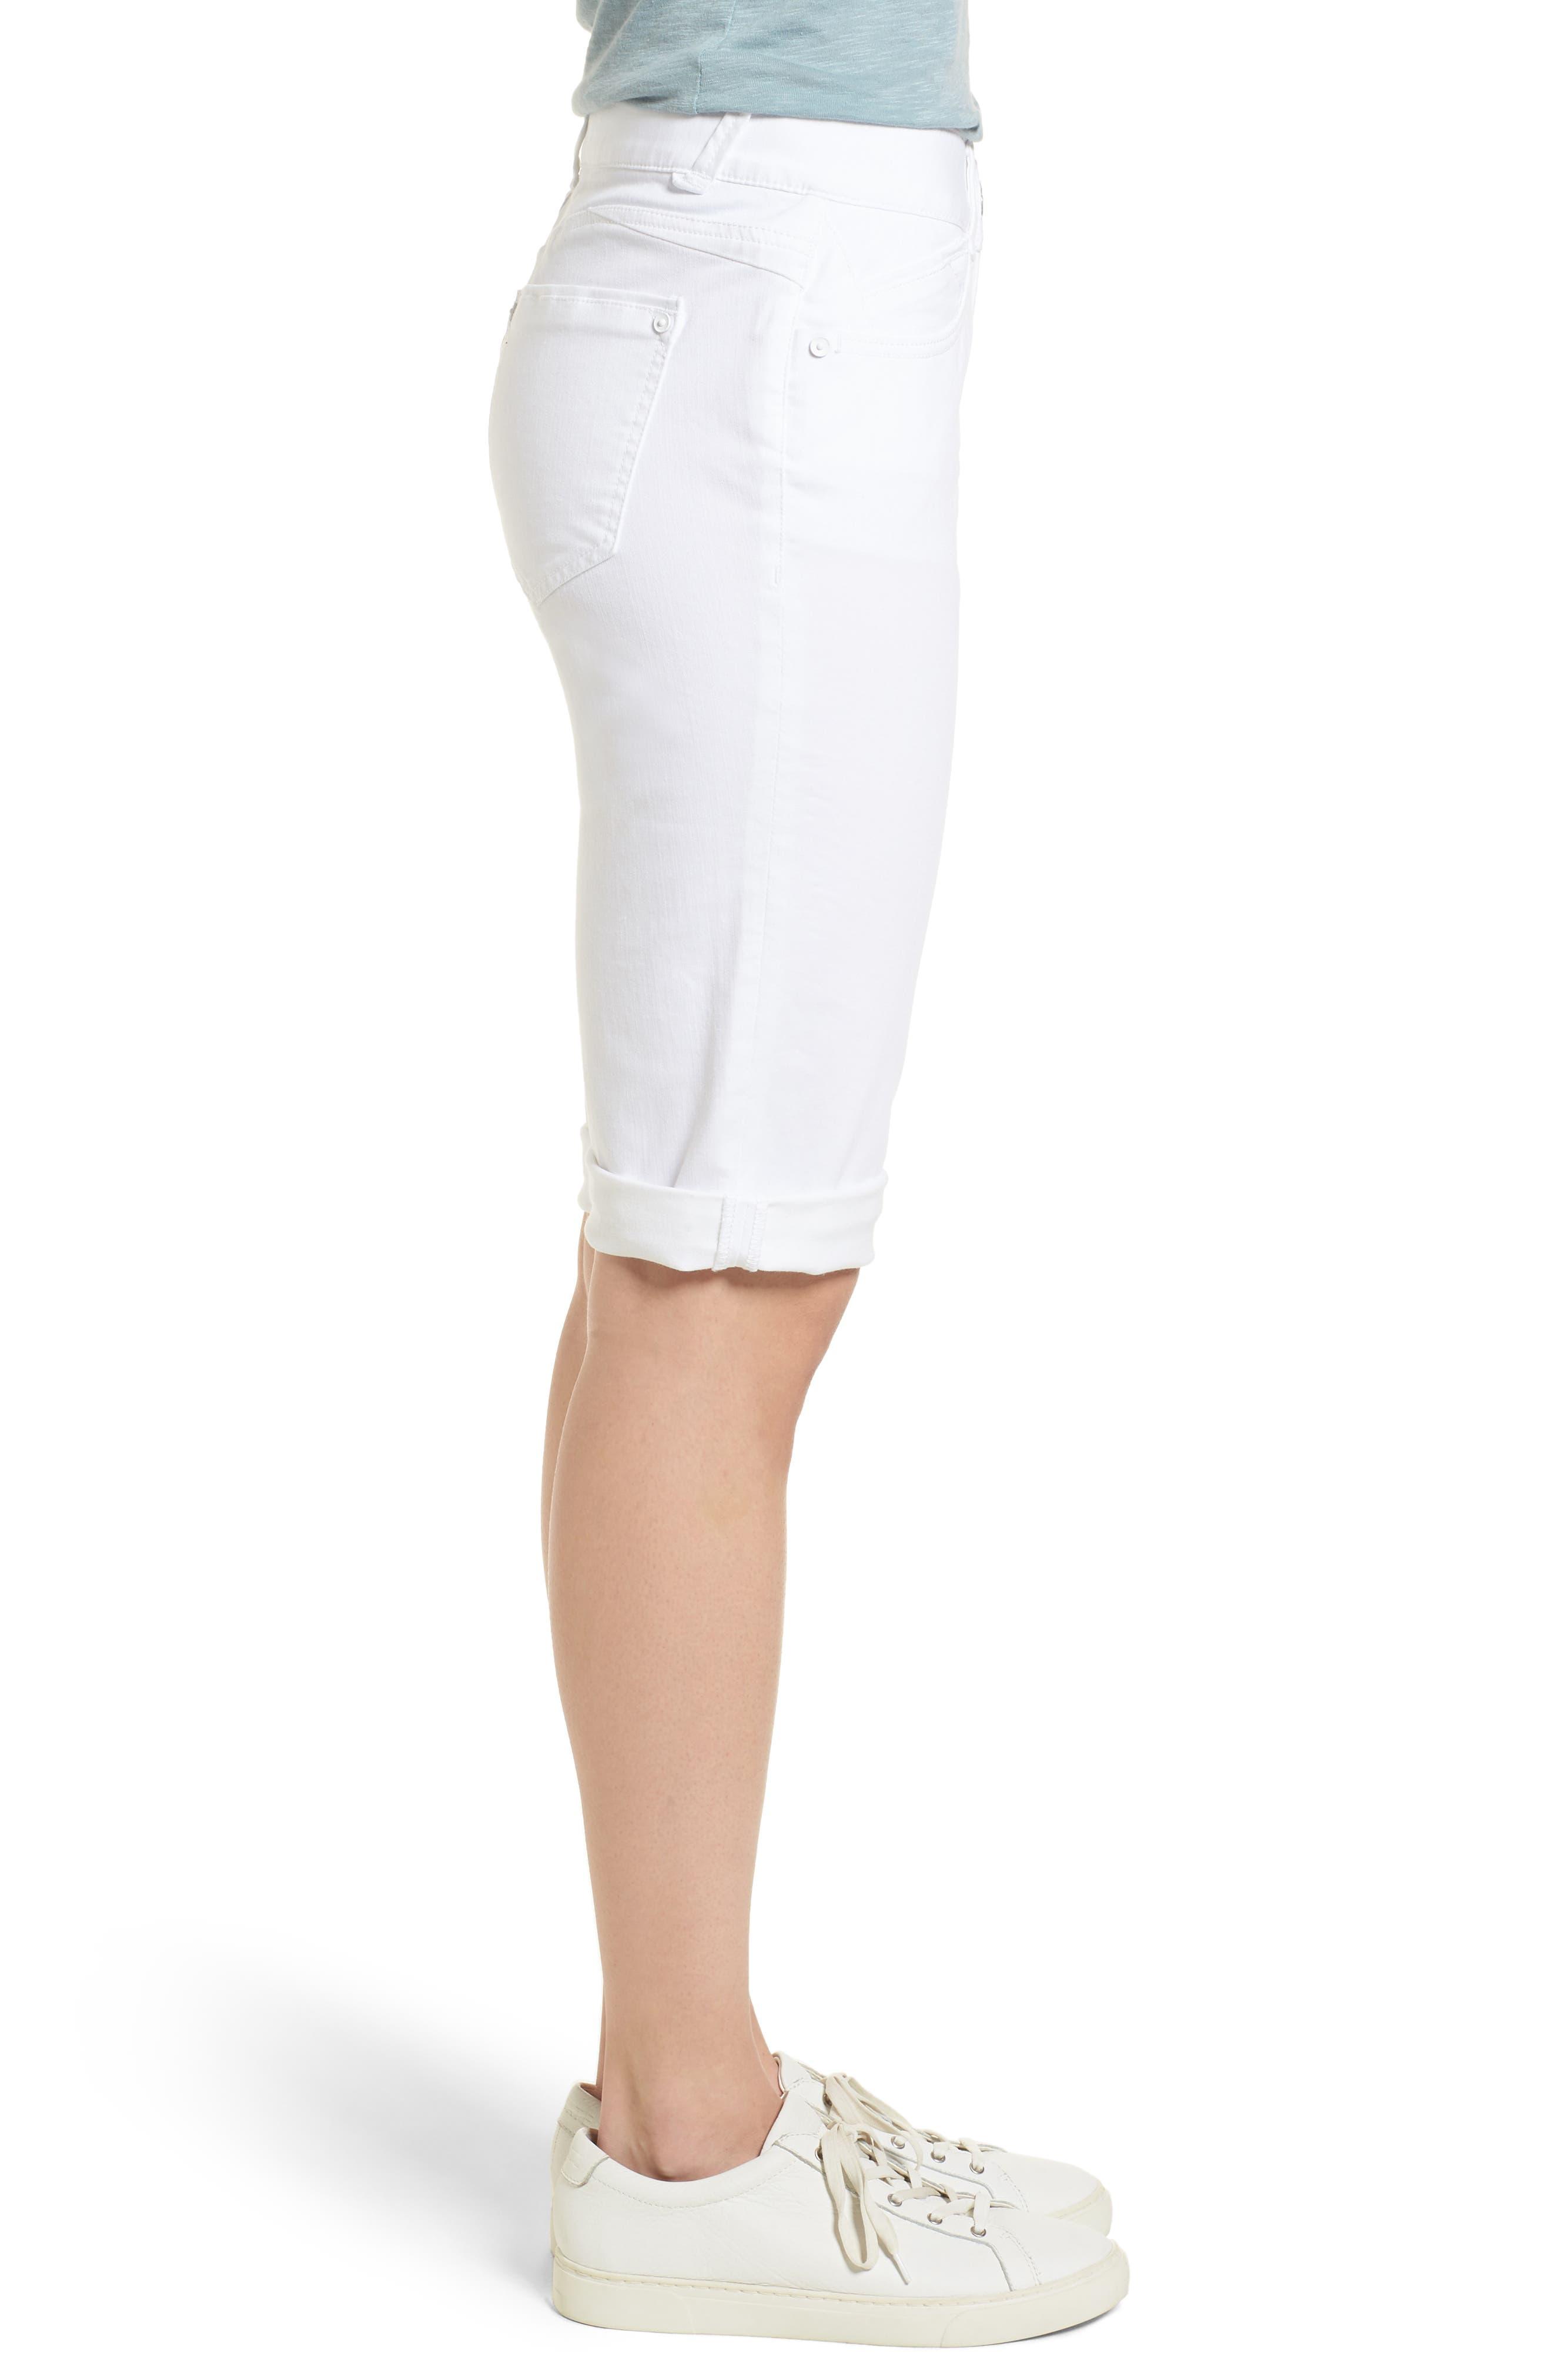 Ab-solution White Bermuda Shorts,                             Alternate thumbnail 3, color,                             106